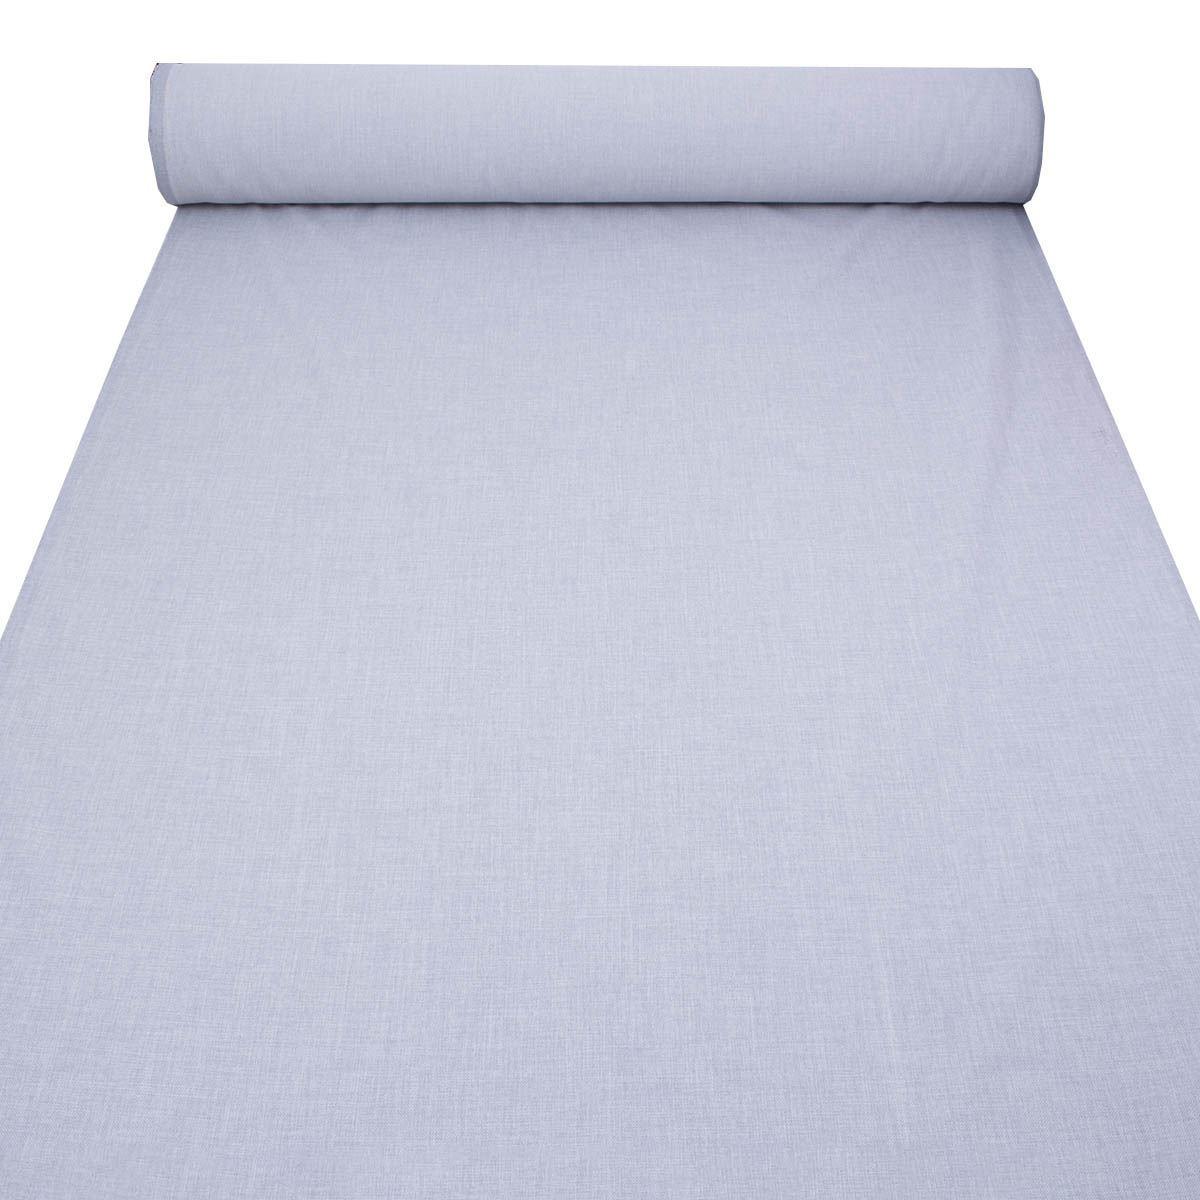 soft sofa material floating in living room plain linen look designer curtain cushion